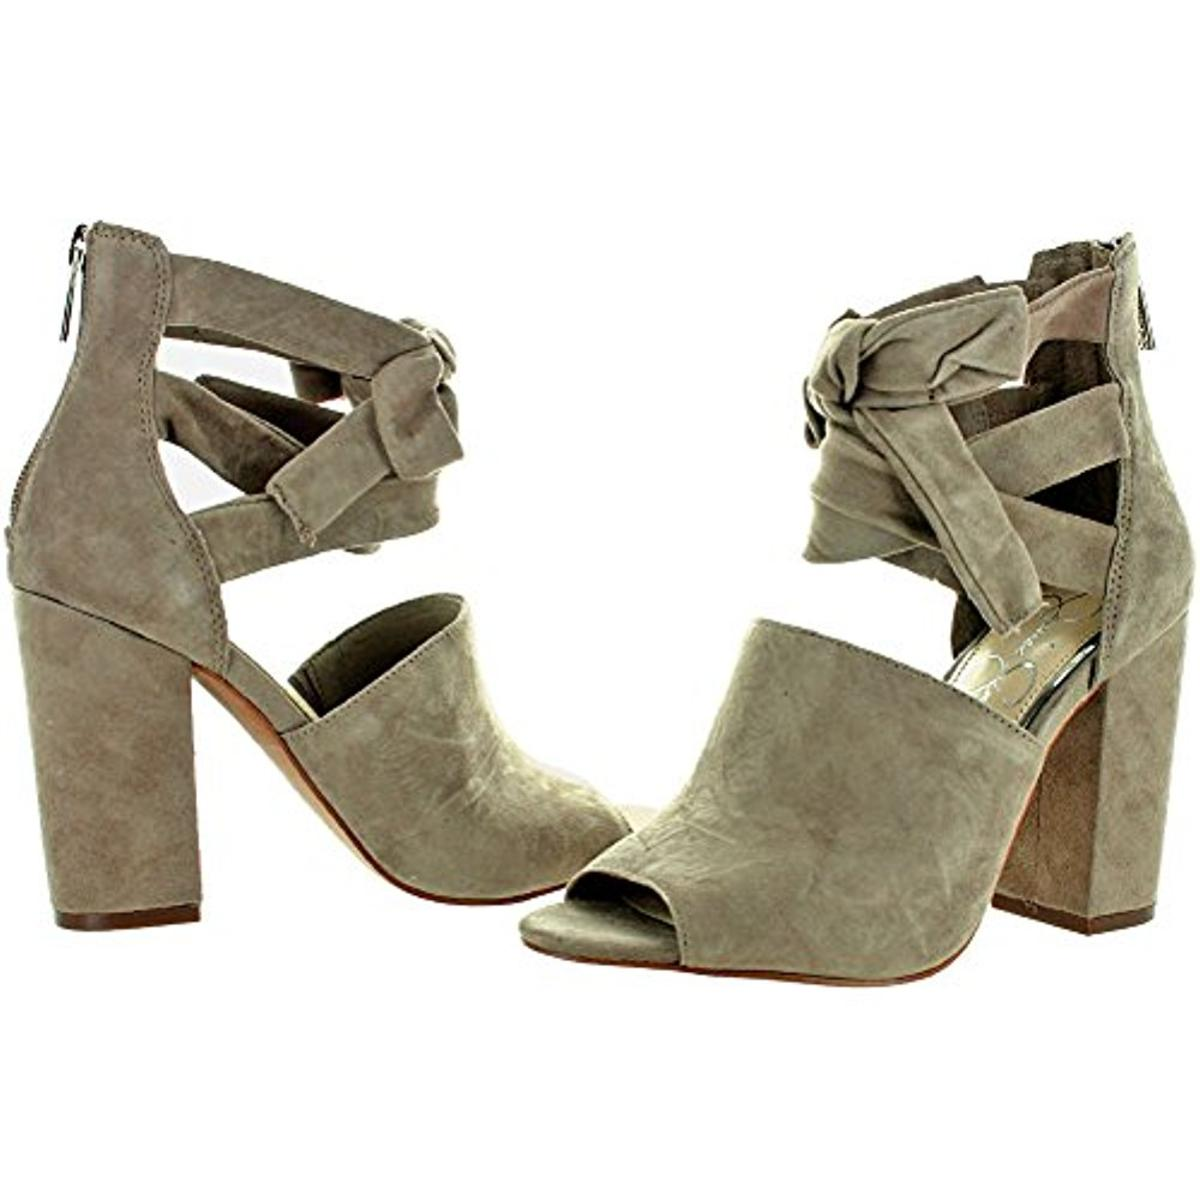 Jessica-Simpson-Kandiss-Women-039-s-Open-Toe-Block-Heel-Dress-Shoes thumbnail 8